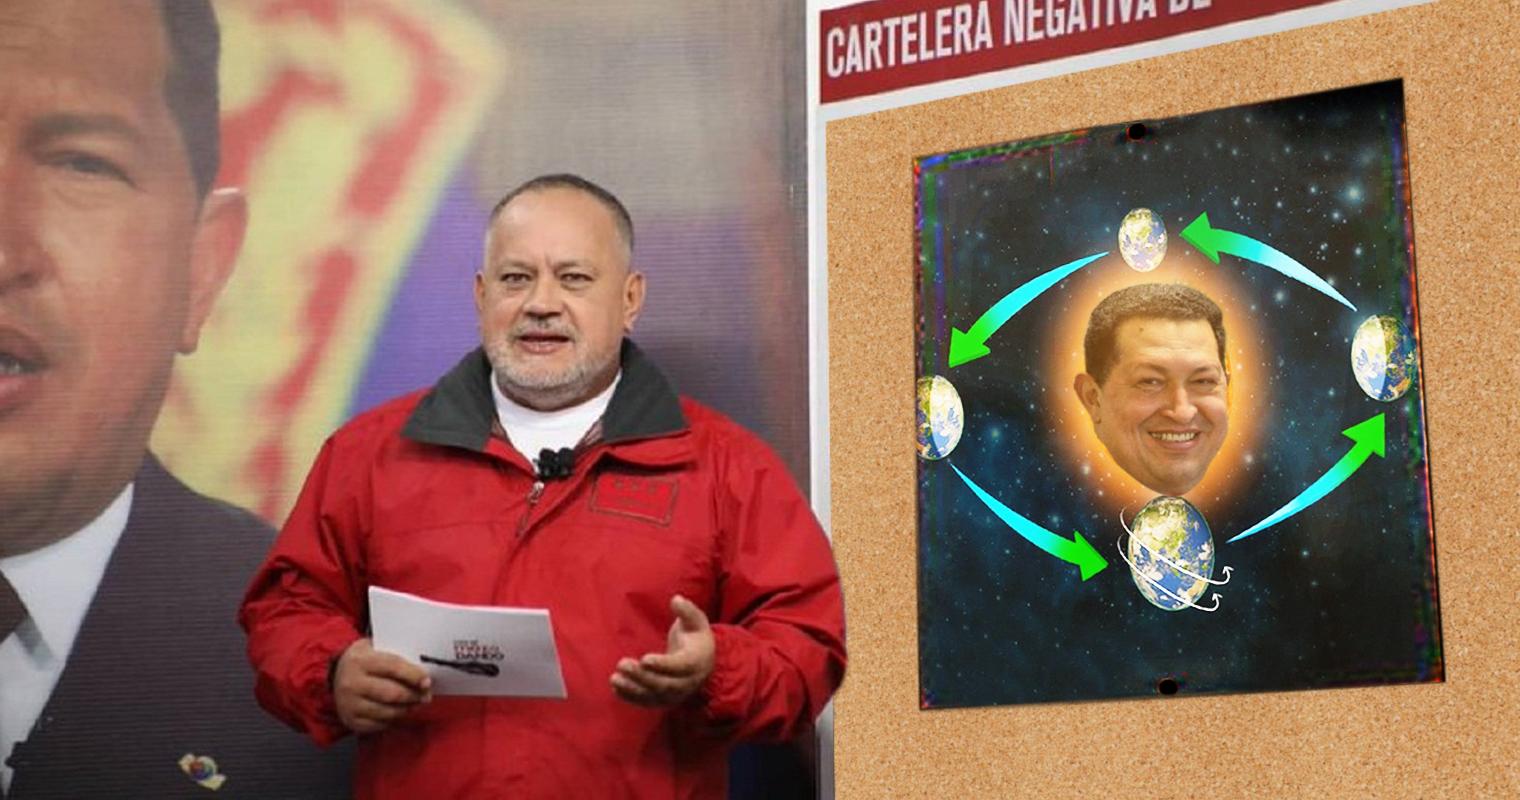 Diosdado amenaza a Galileo por negar que la Tierra gira alrededor de Chávez